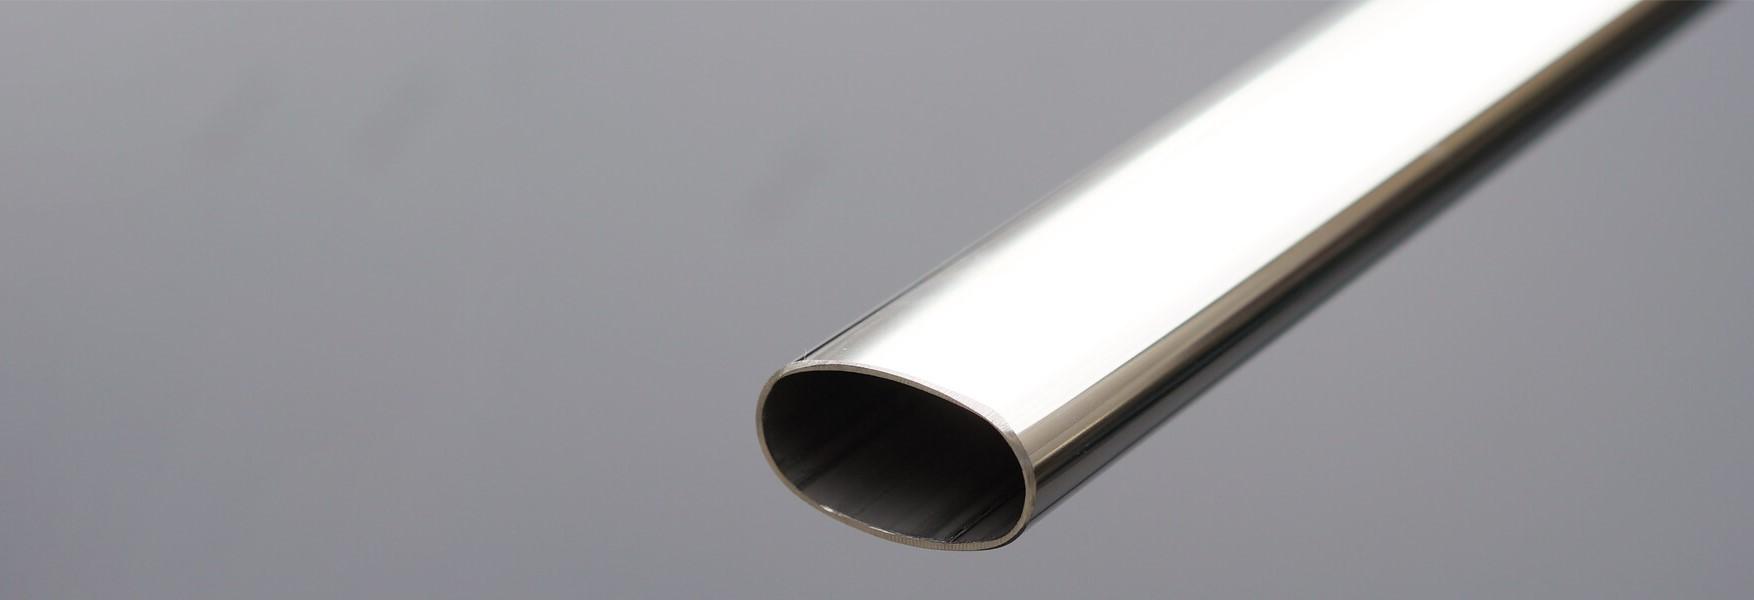 Oval-Tube-1